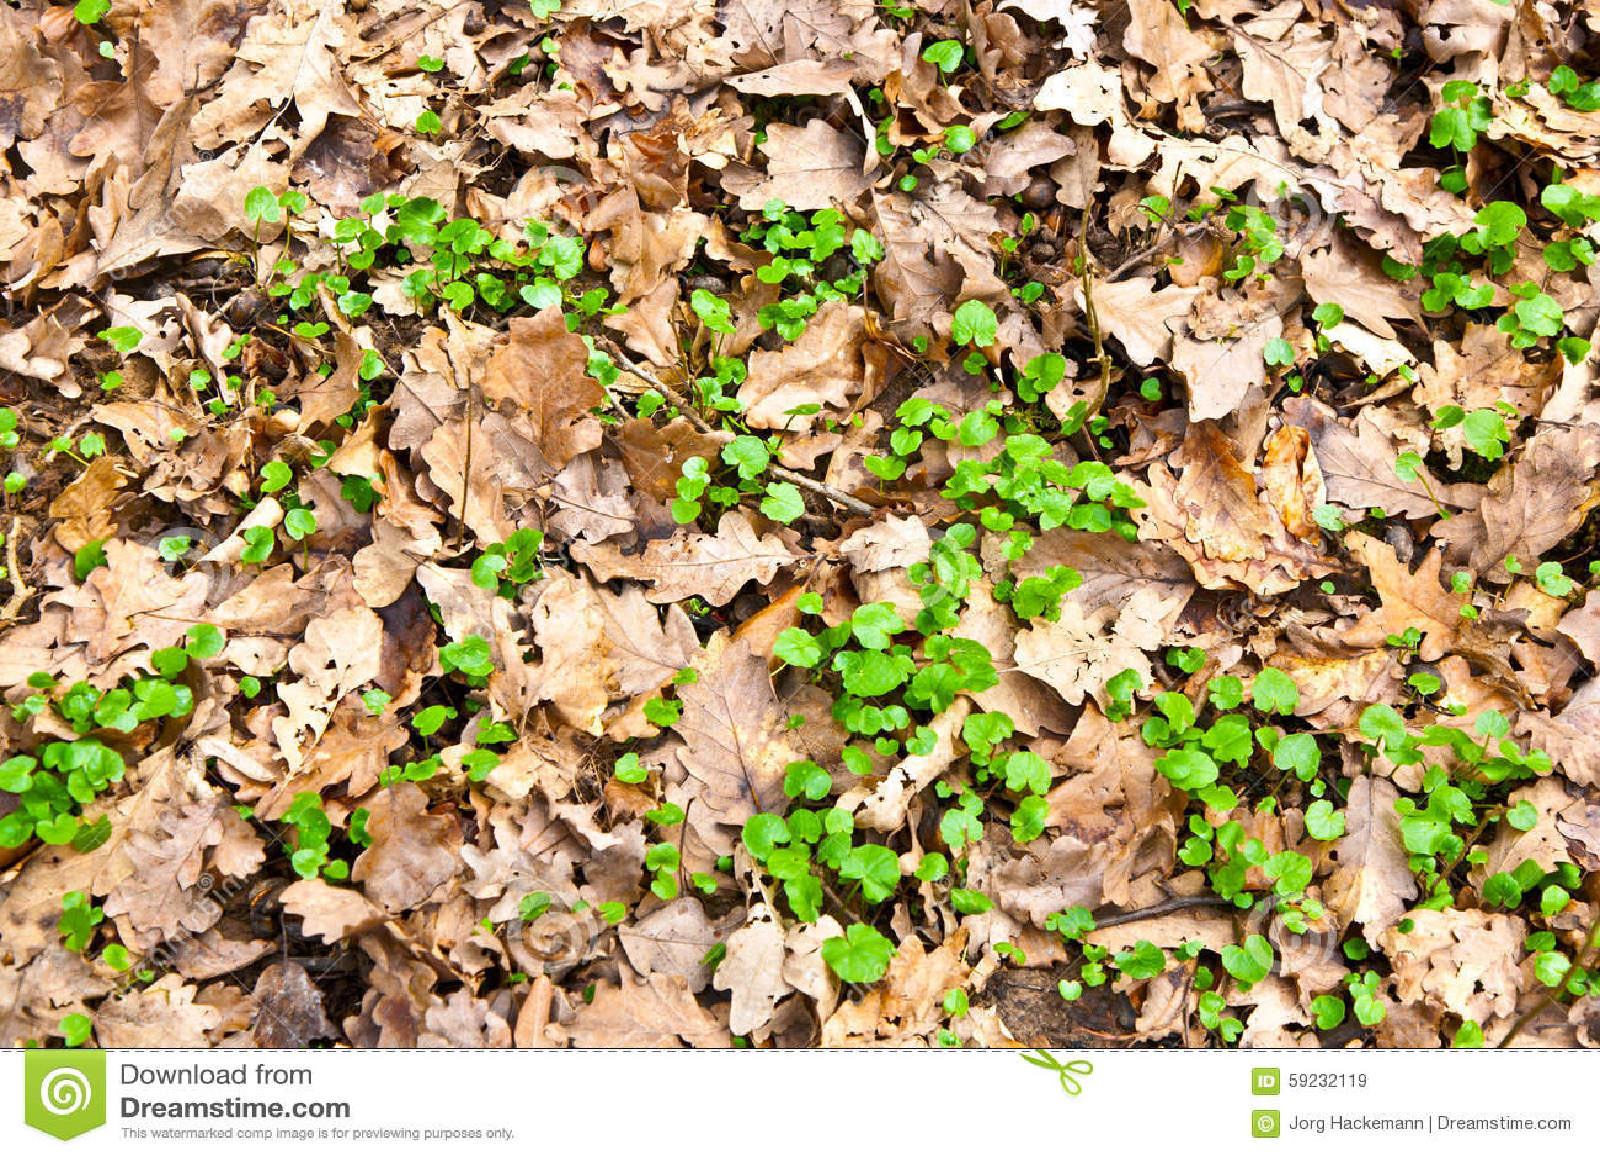 Download Modelo de hojas imagen de archivo. Imagen de bosque, outdoor - 59232119